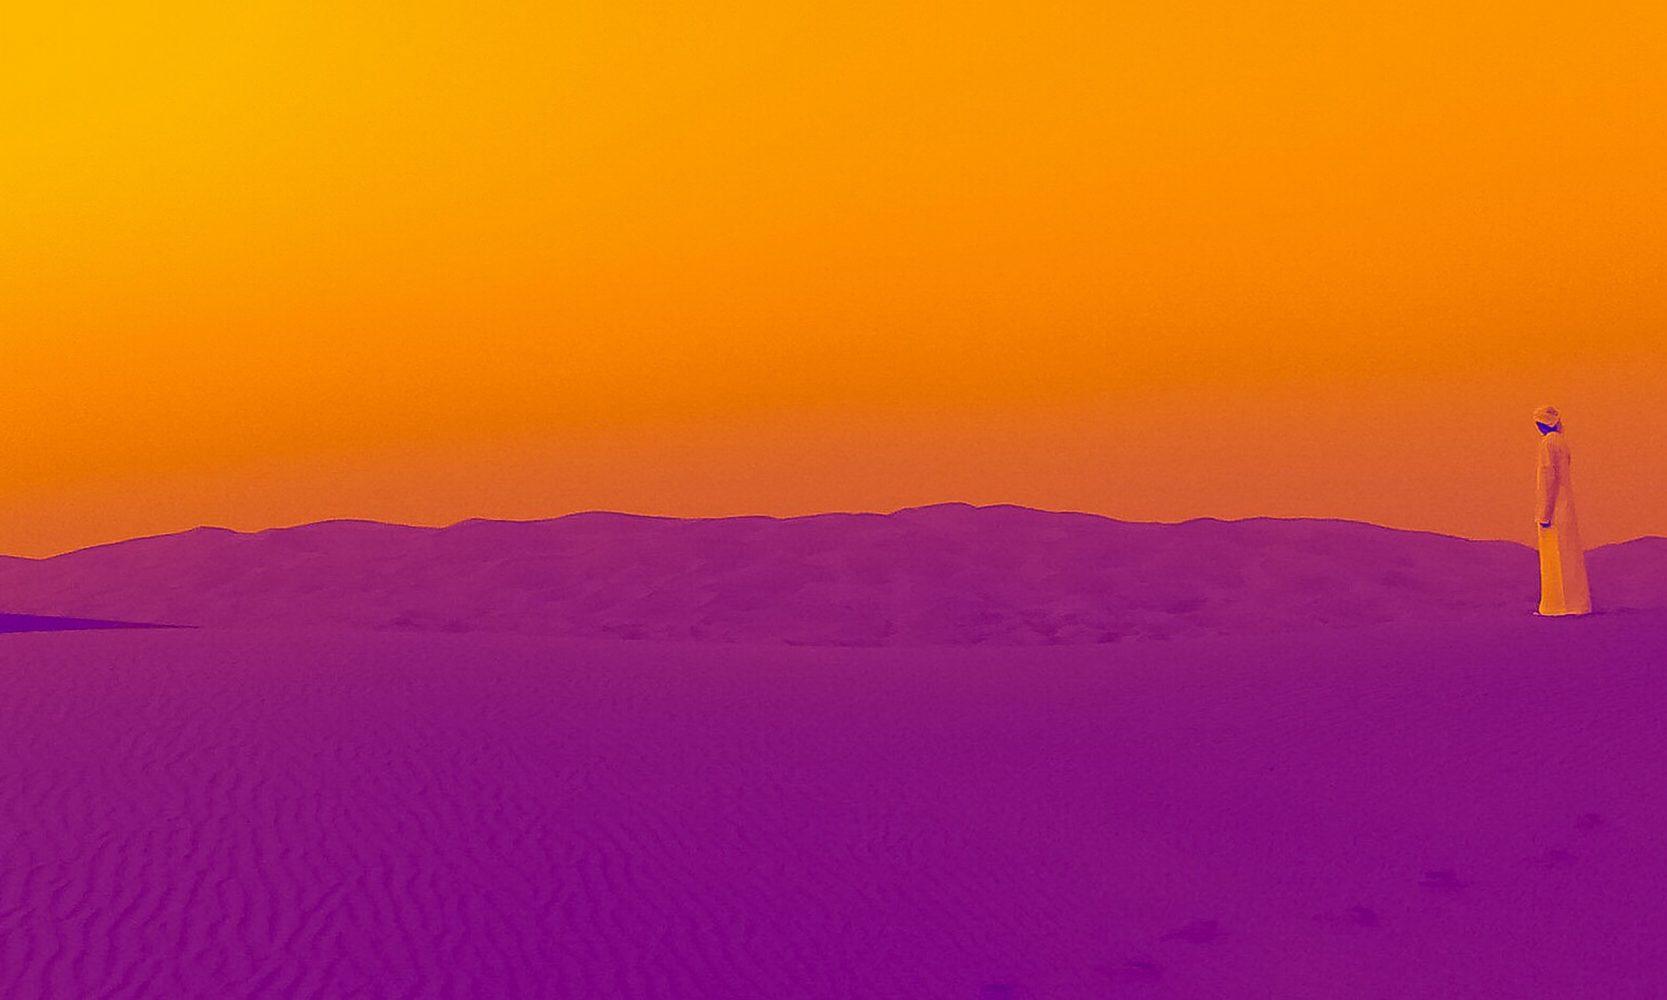 purple and orange desert